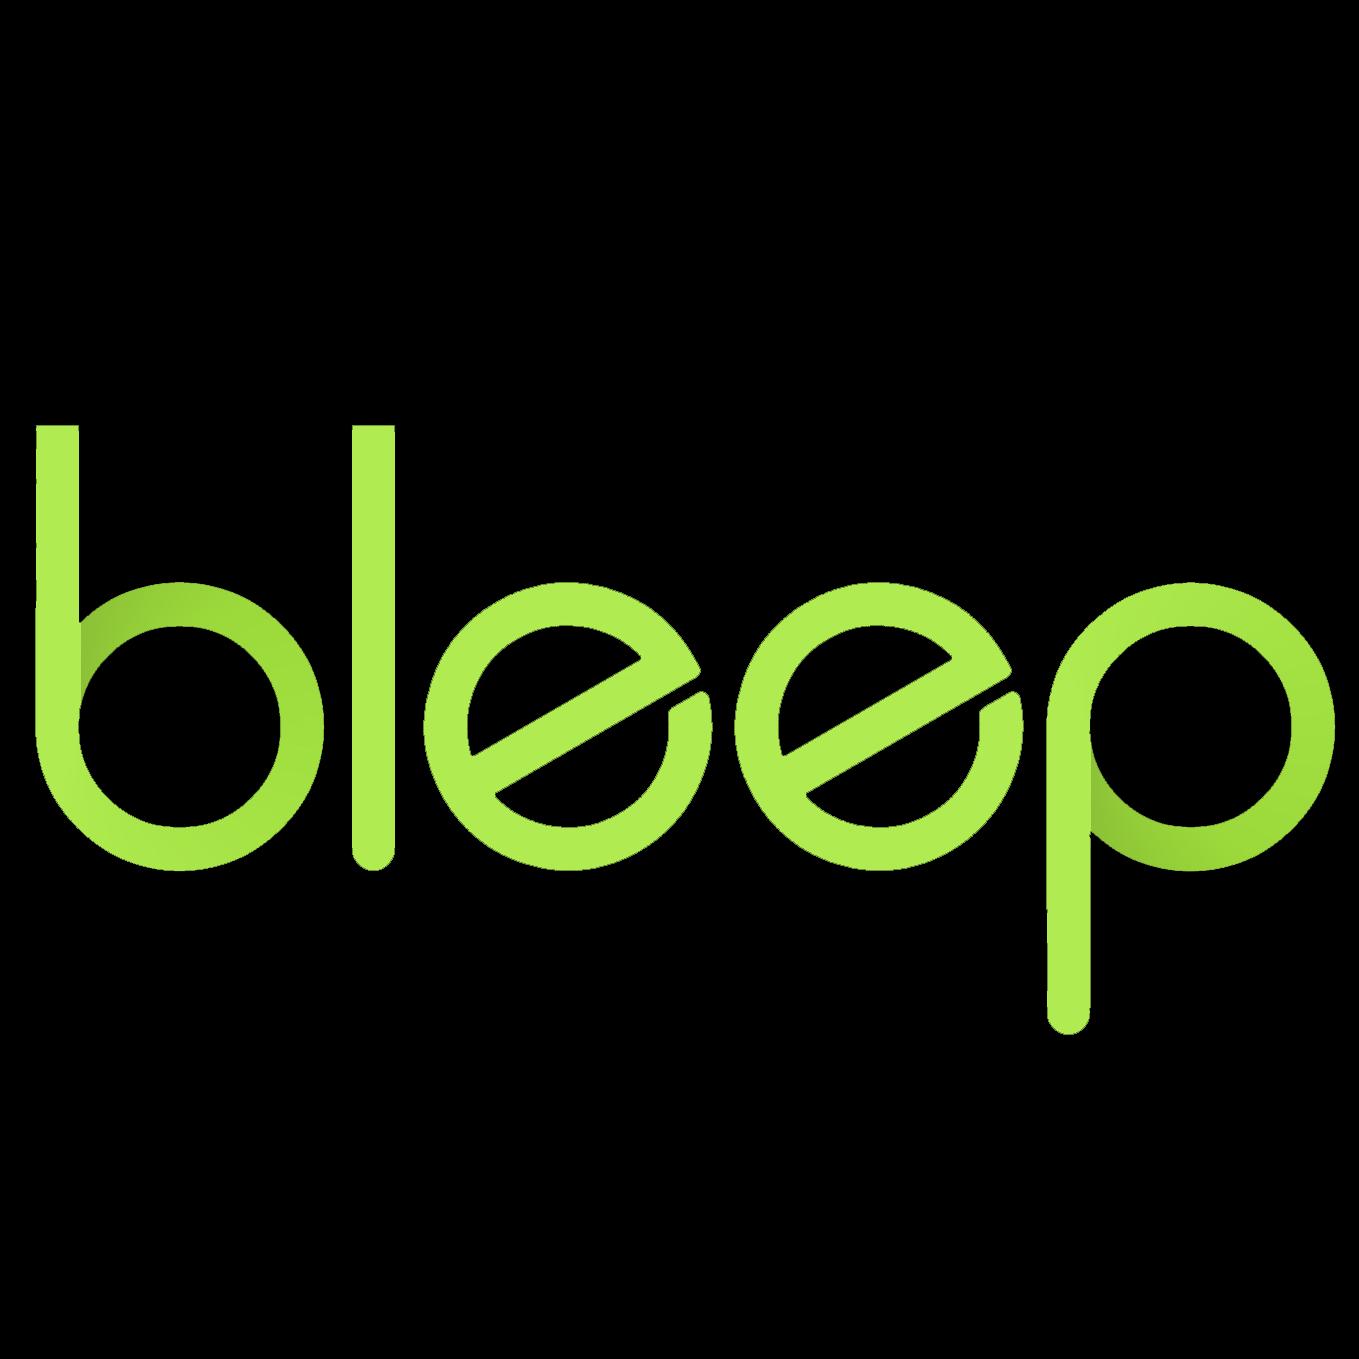 bleep